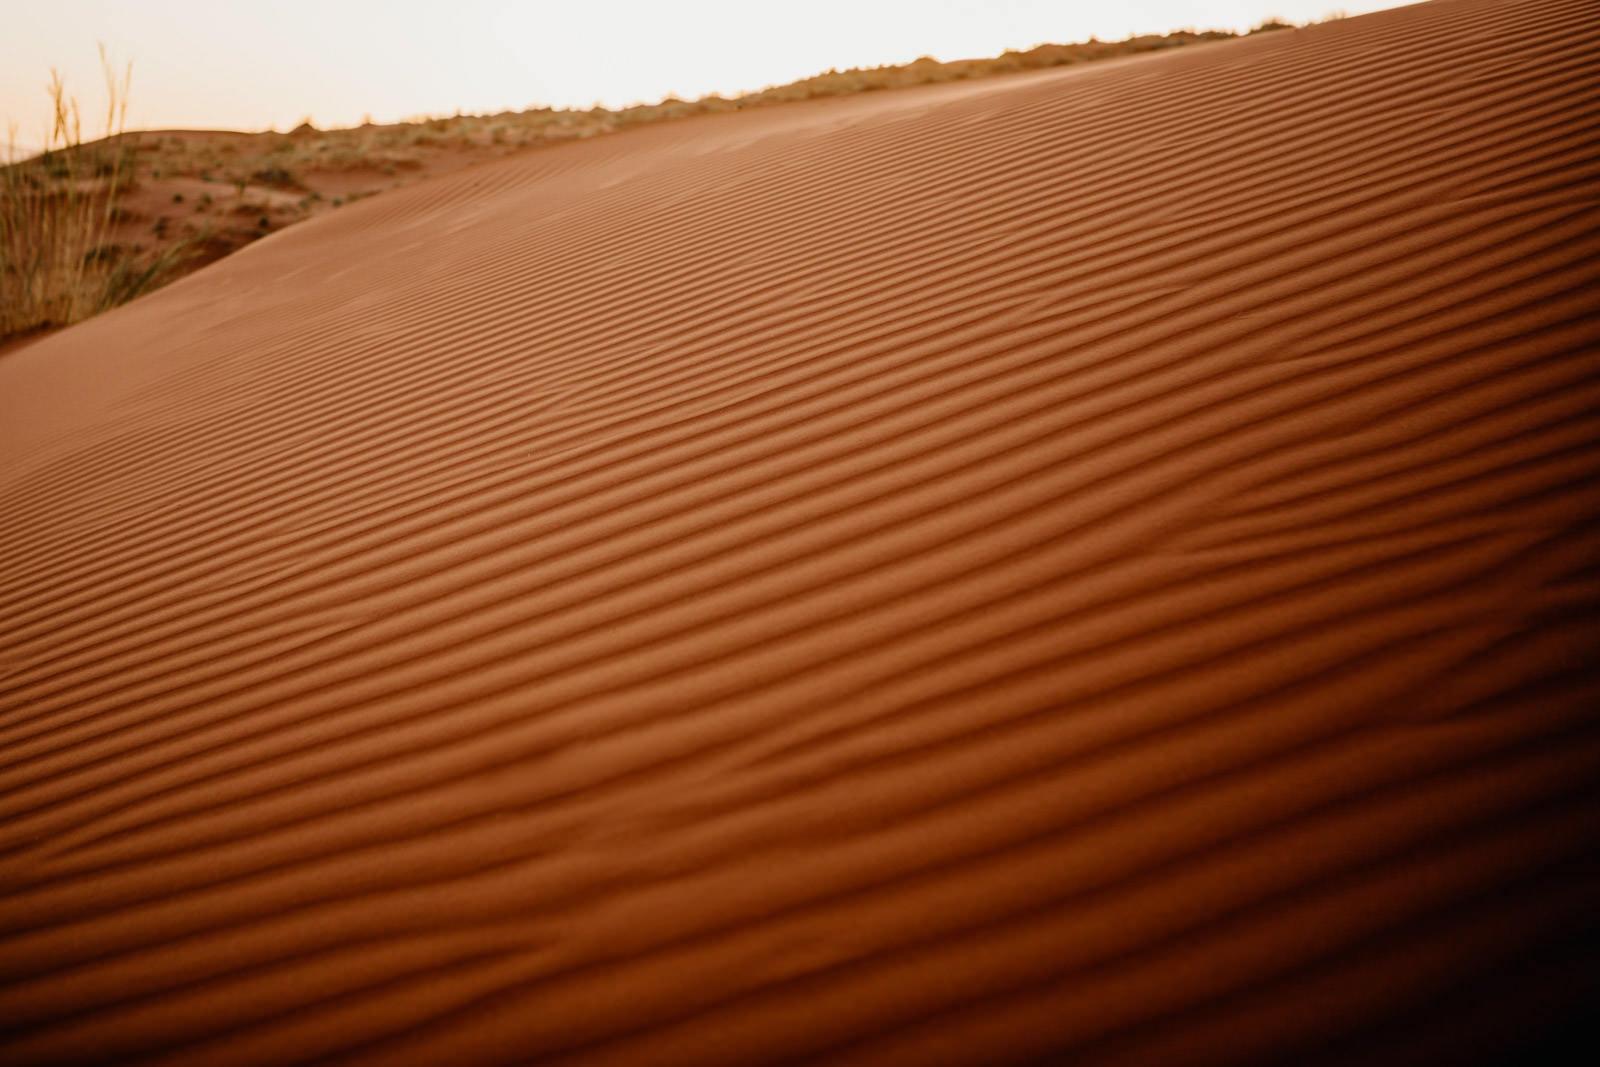 namibia_trip_rooftent_camping_roadtrip (2 von 26).jpg